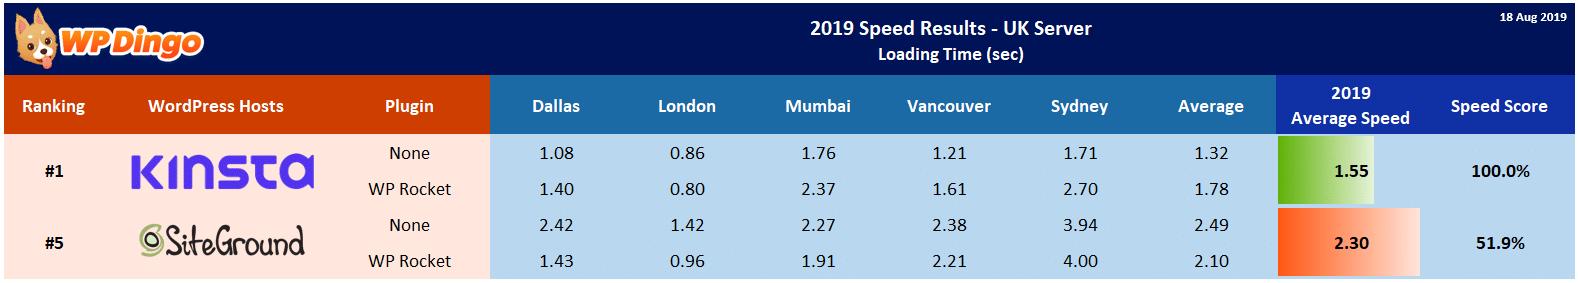 2019 Kinsta vs SiteGround Speed Table - UK Server